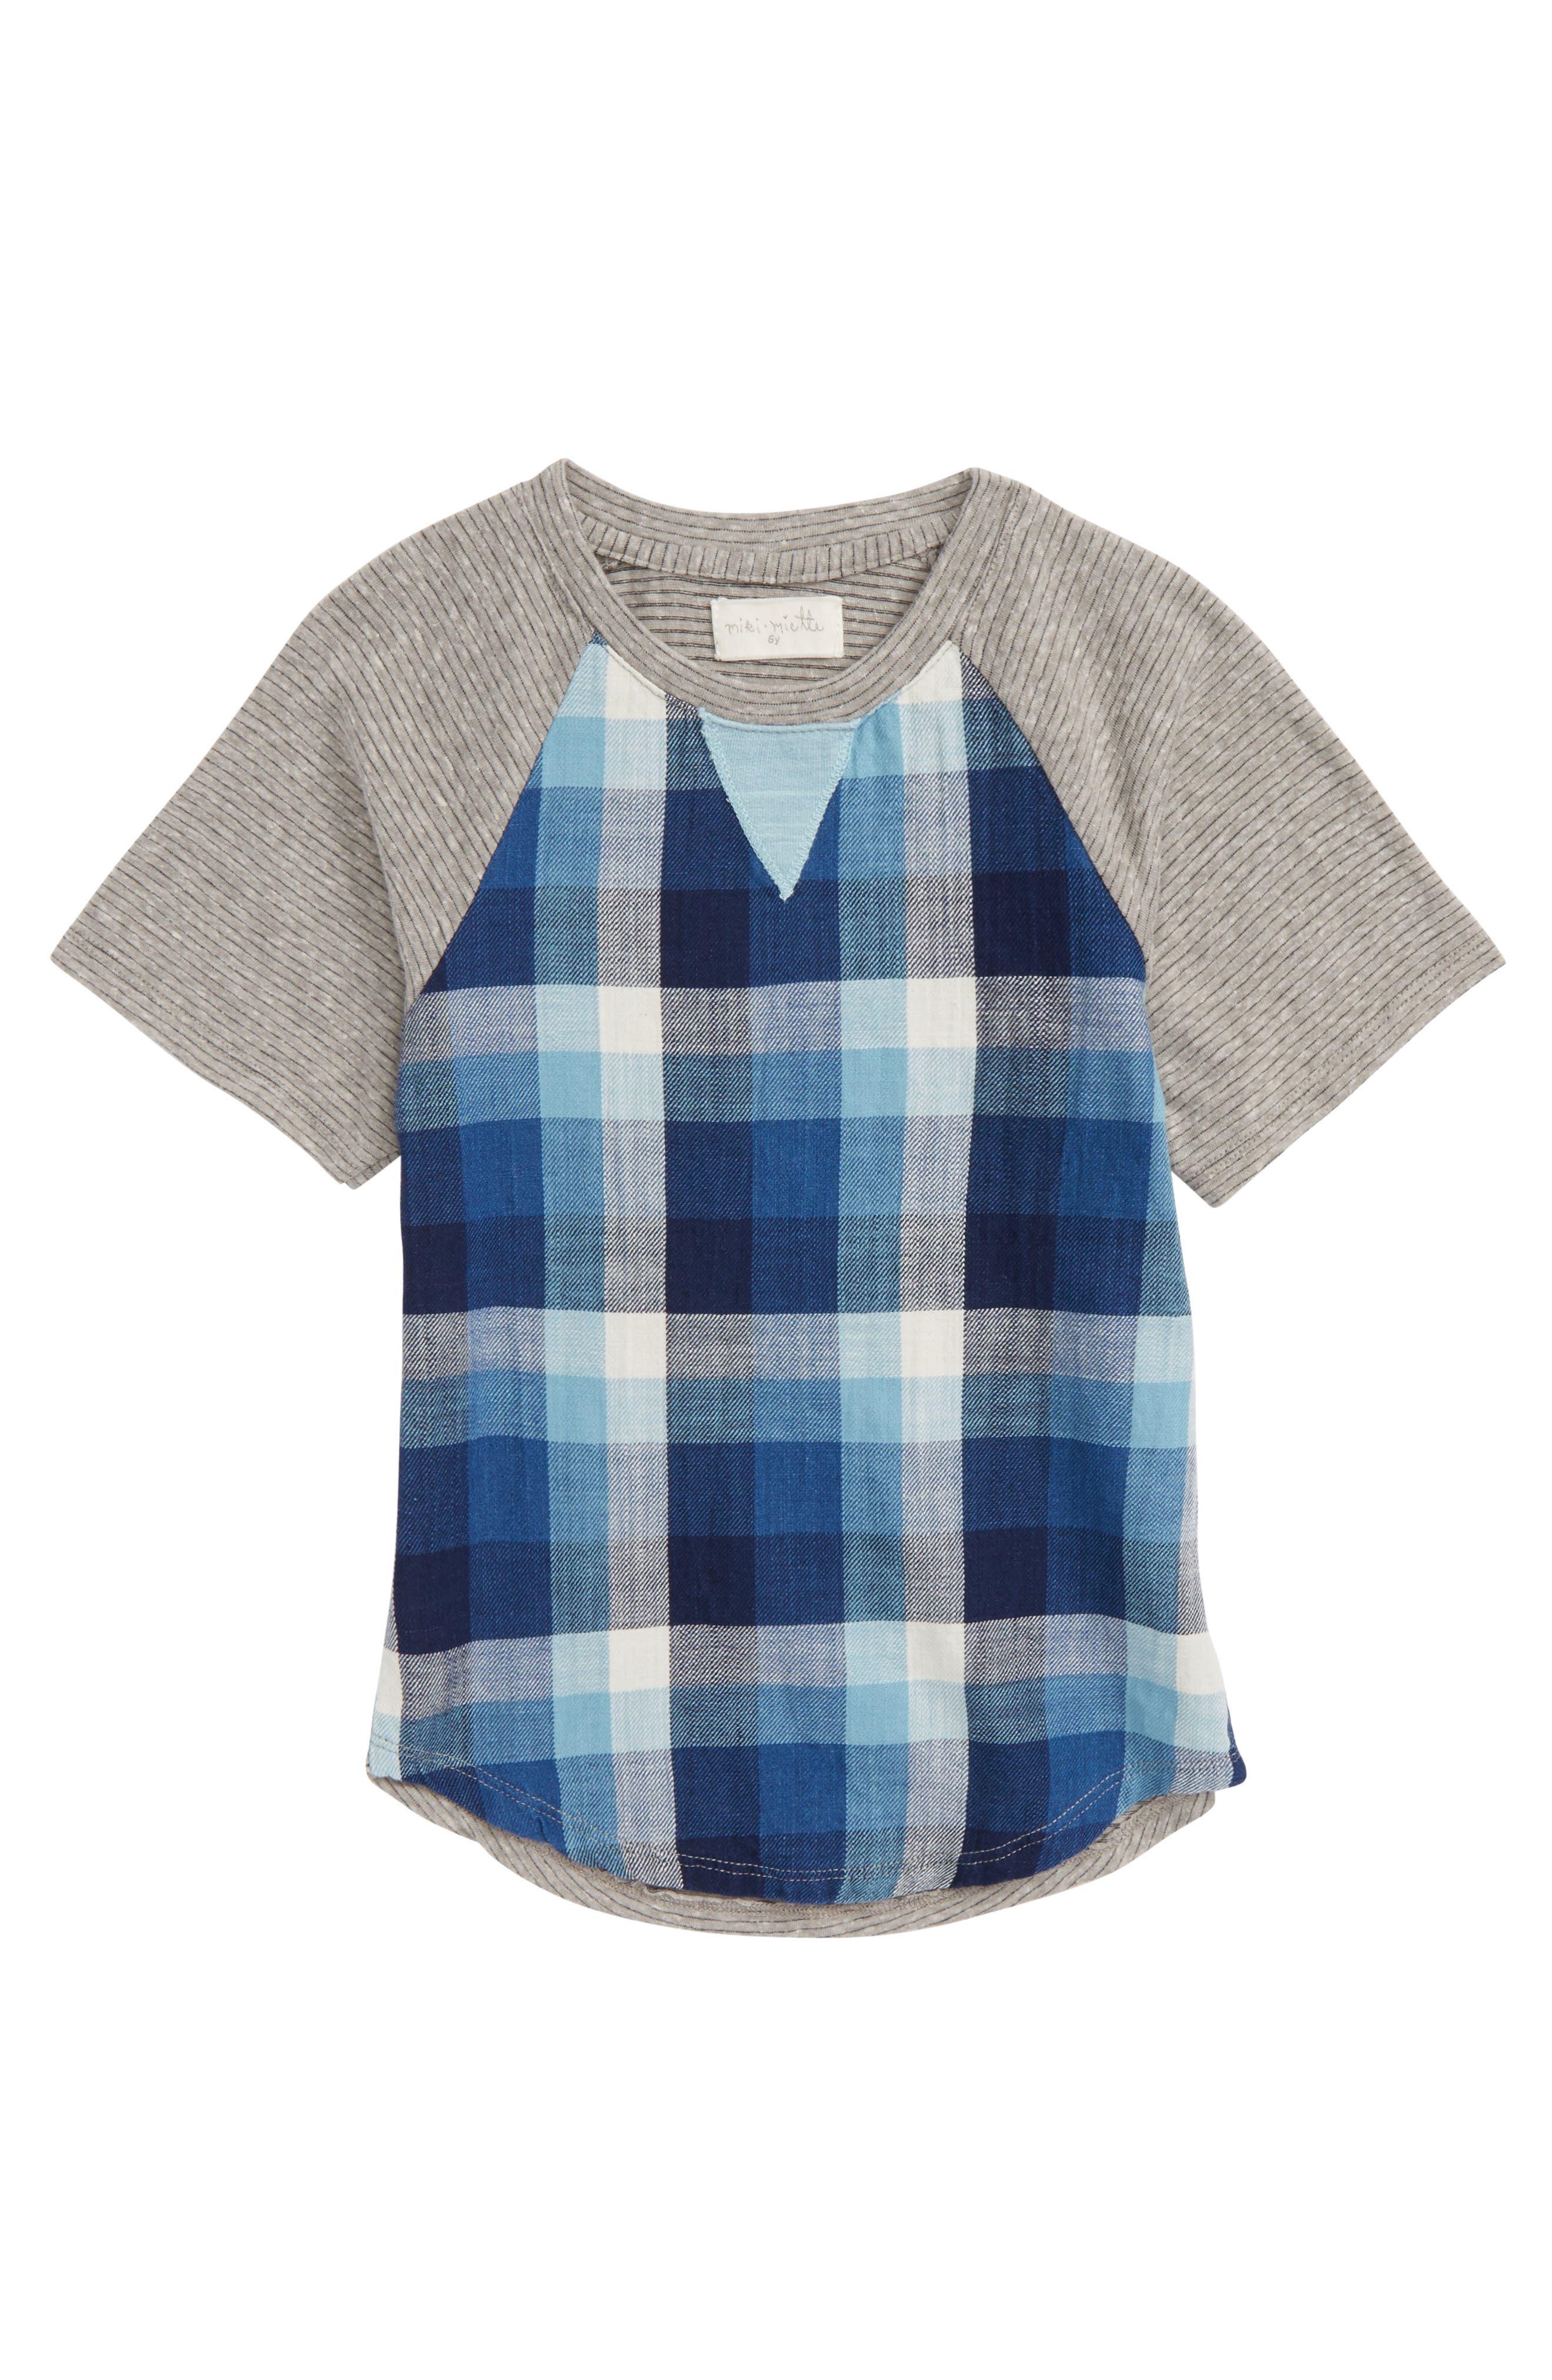 Alternate Image 1 Selected - Miki Miette Caz Plaid T-Shirt (Toddler Boys, Little Boys & Big Boys)